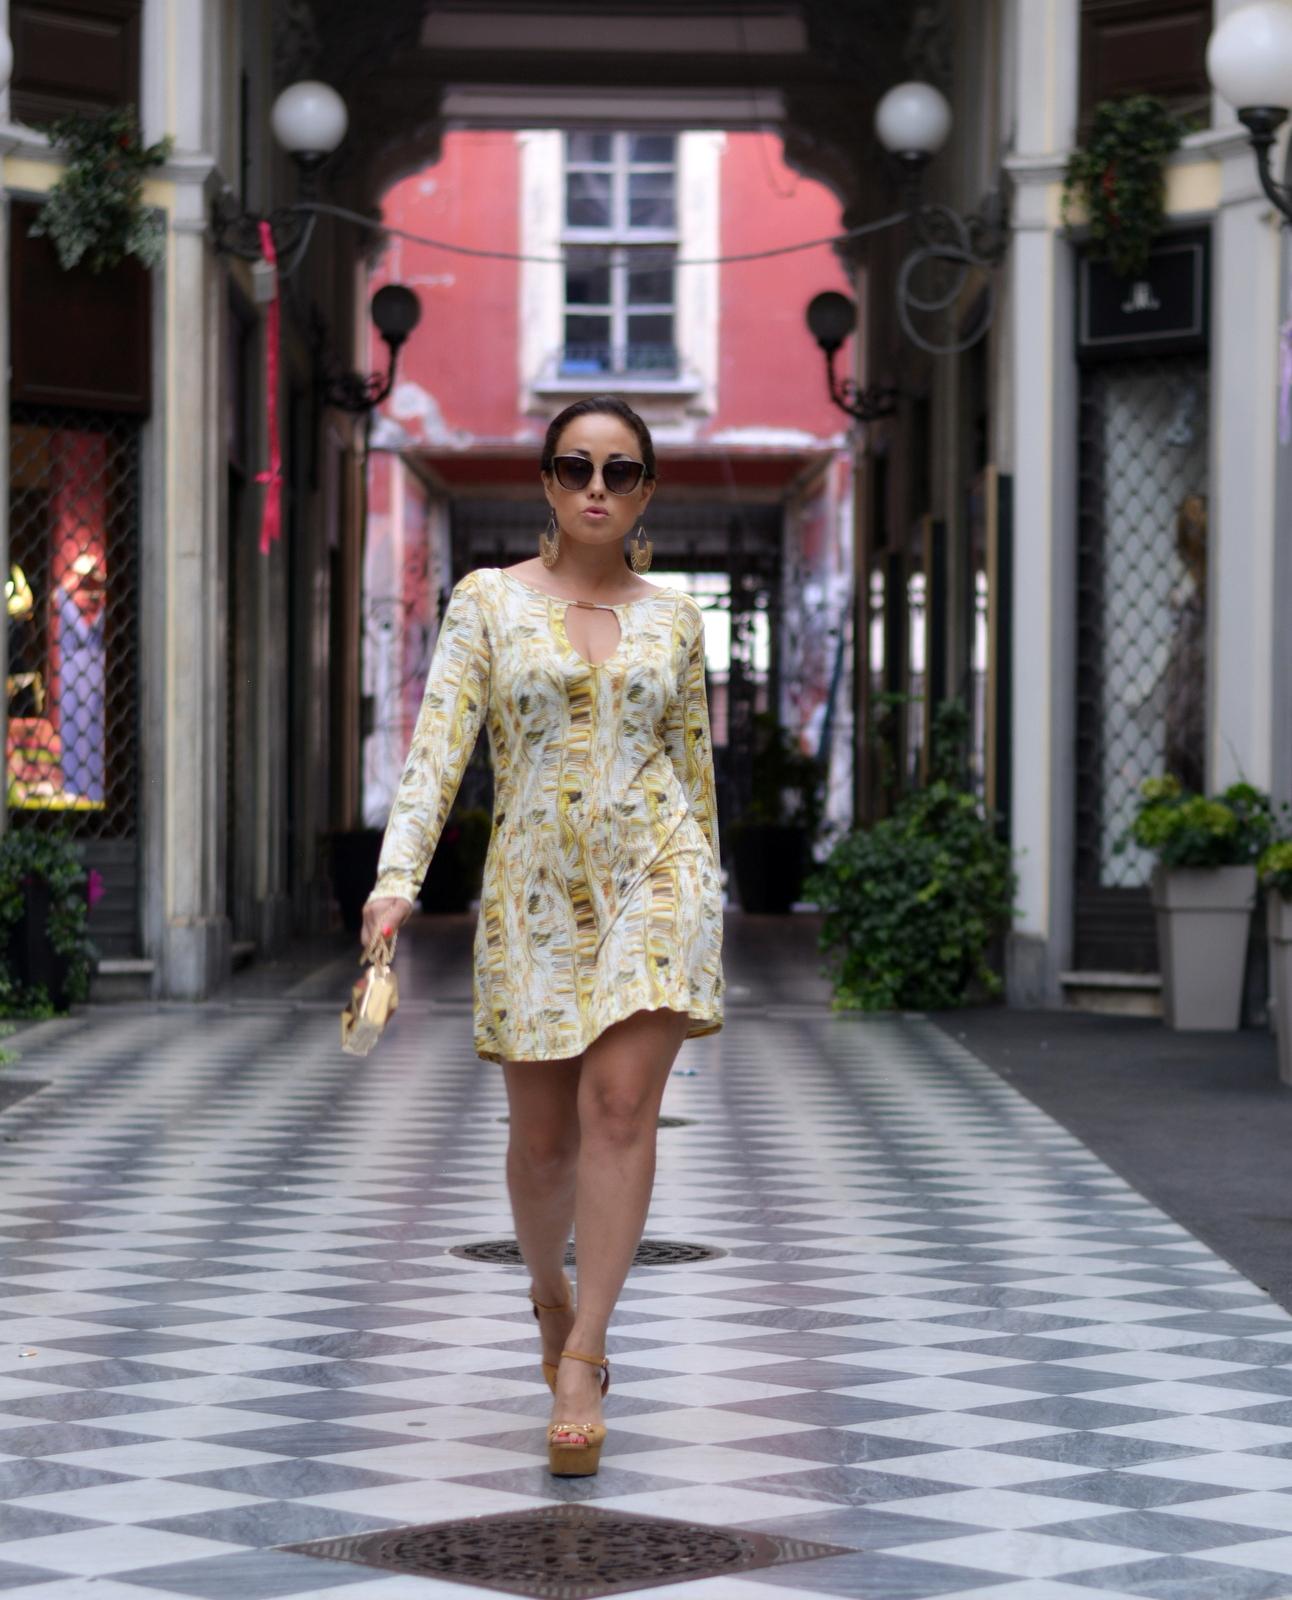 cia maritima, Sante Shoes , Best Fashion Blogger, Fashion Blogger Italia, Influencer, Party Dress , Beach Looks, Jessica Neumann, outfit,